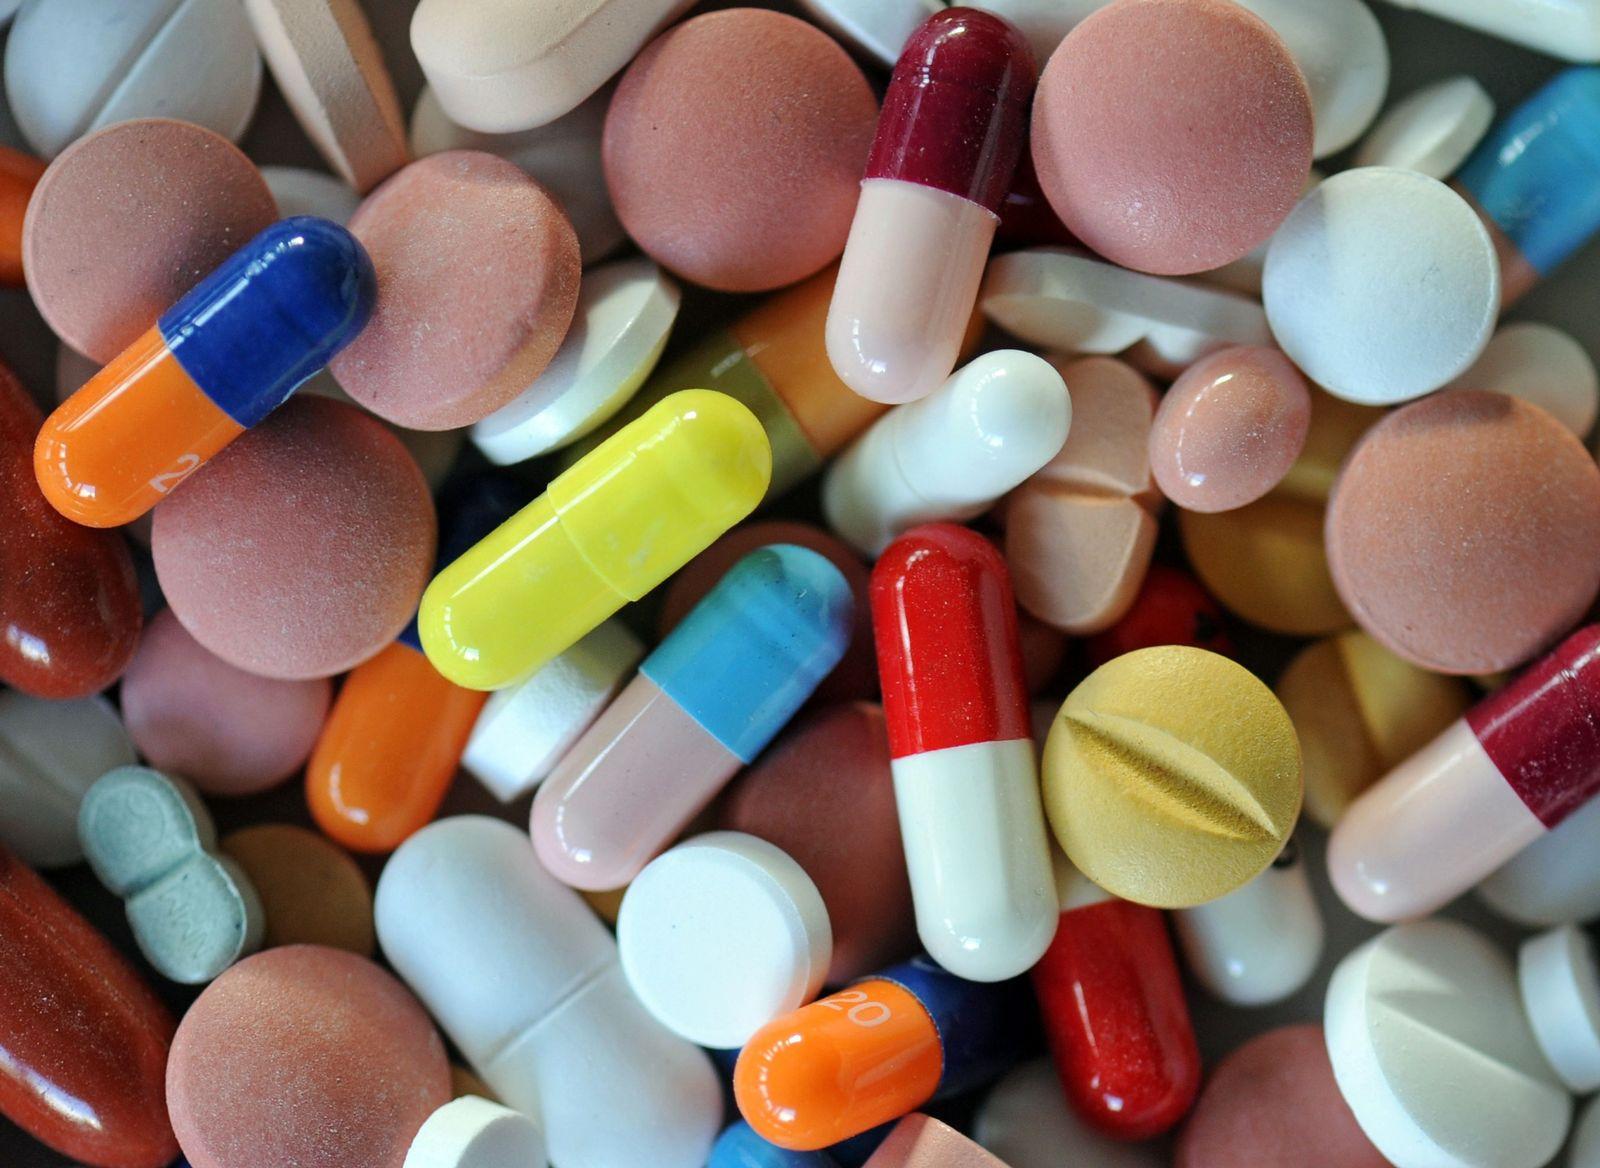 mmo Thema: Medikamente